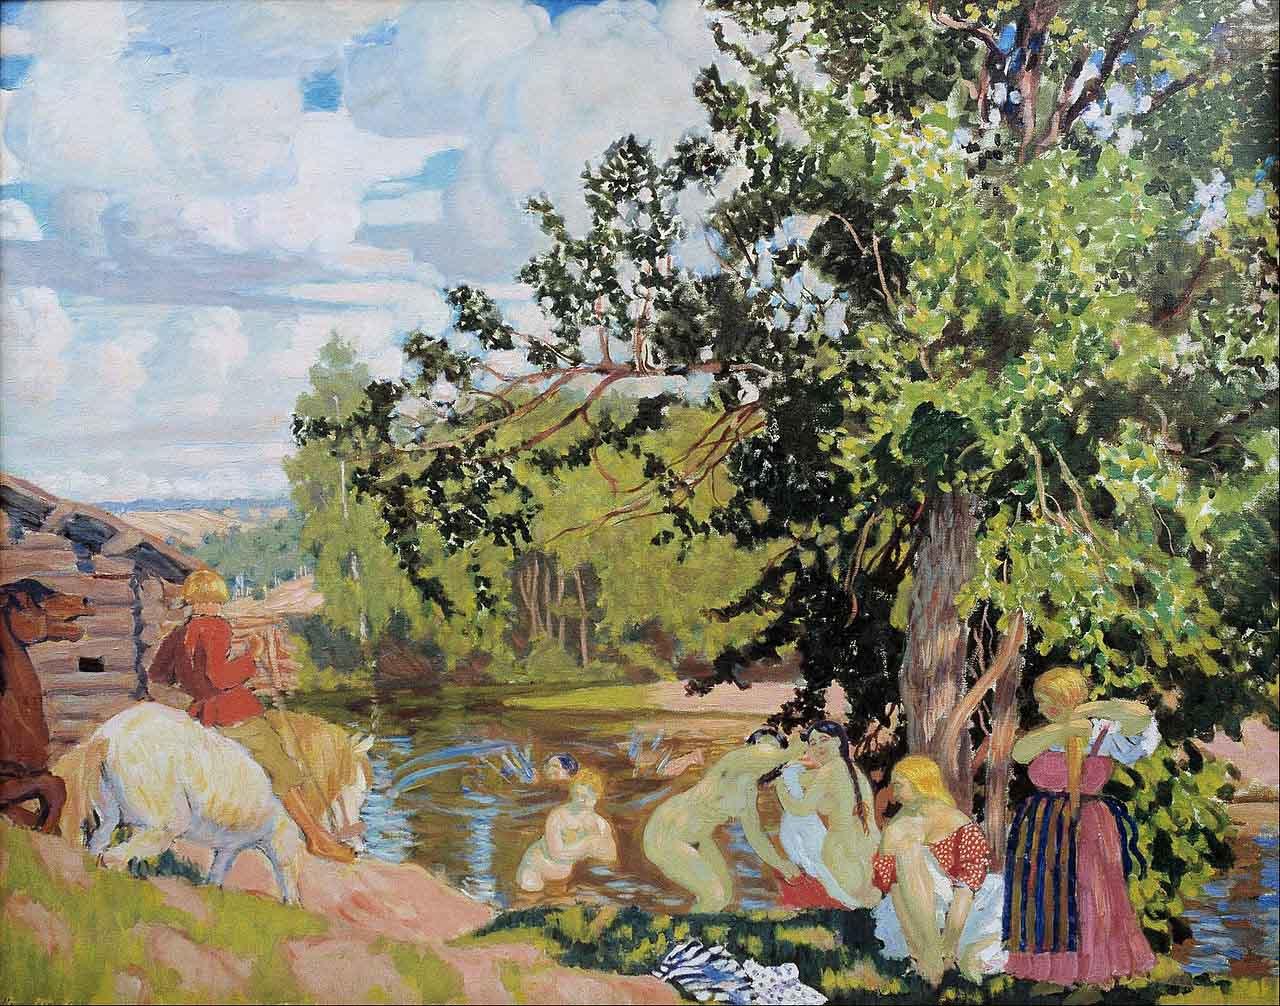 Борис Кустодиев (Boris Kustodiev), The Bath